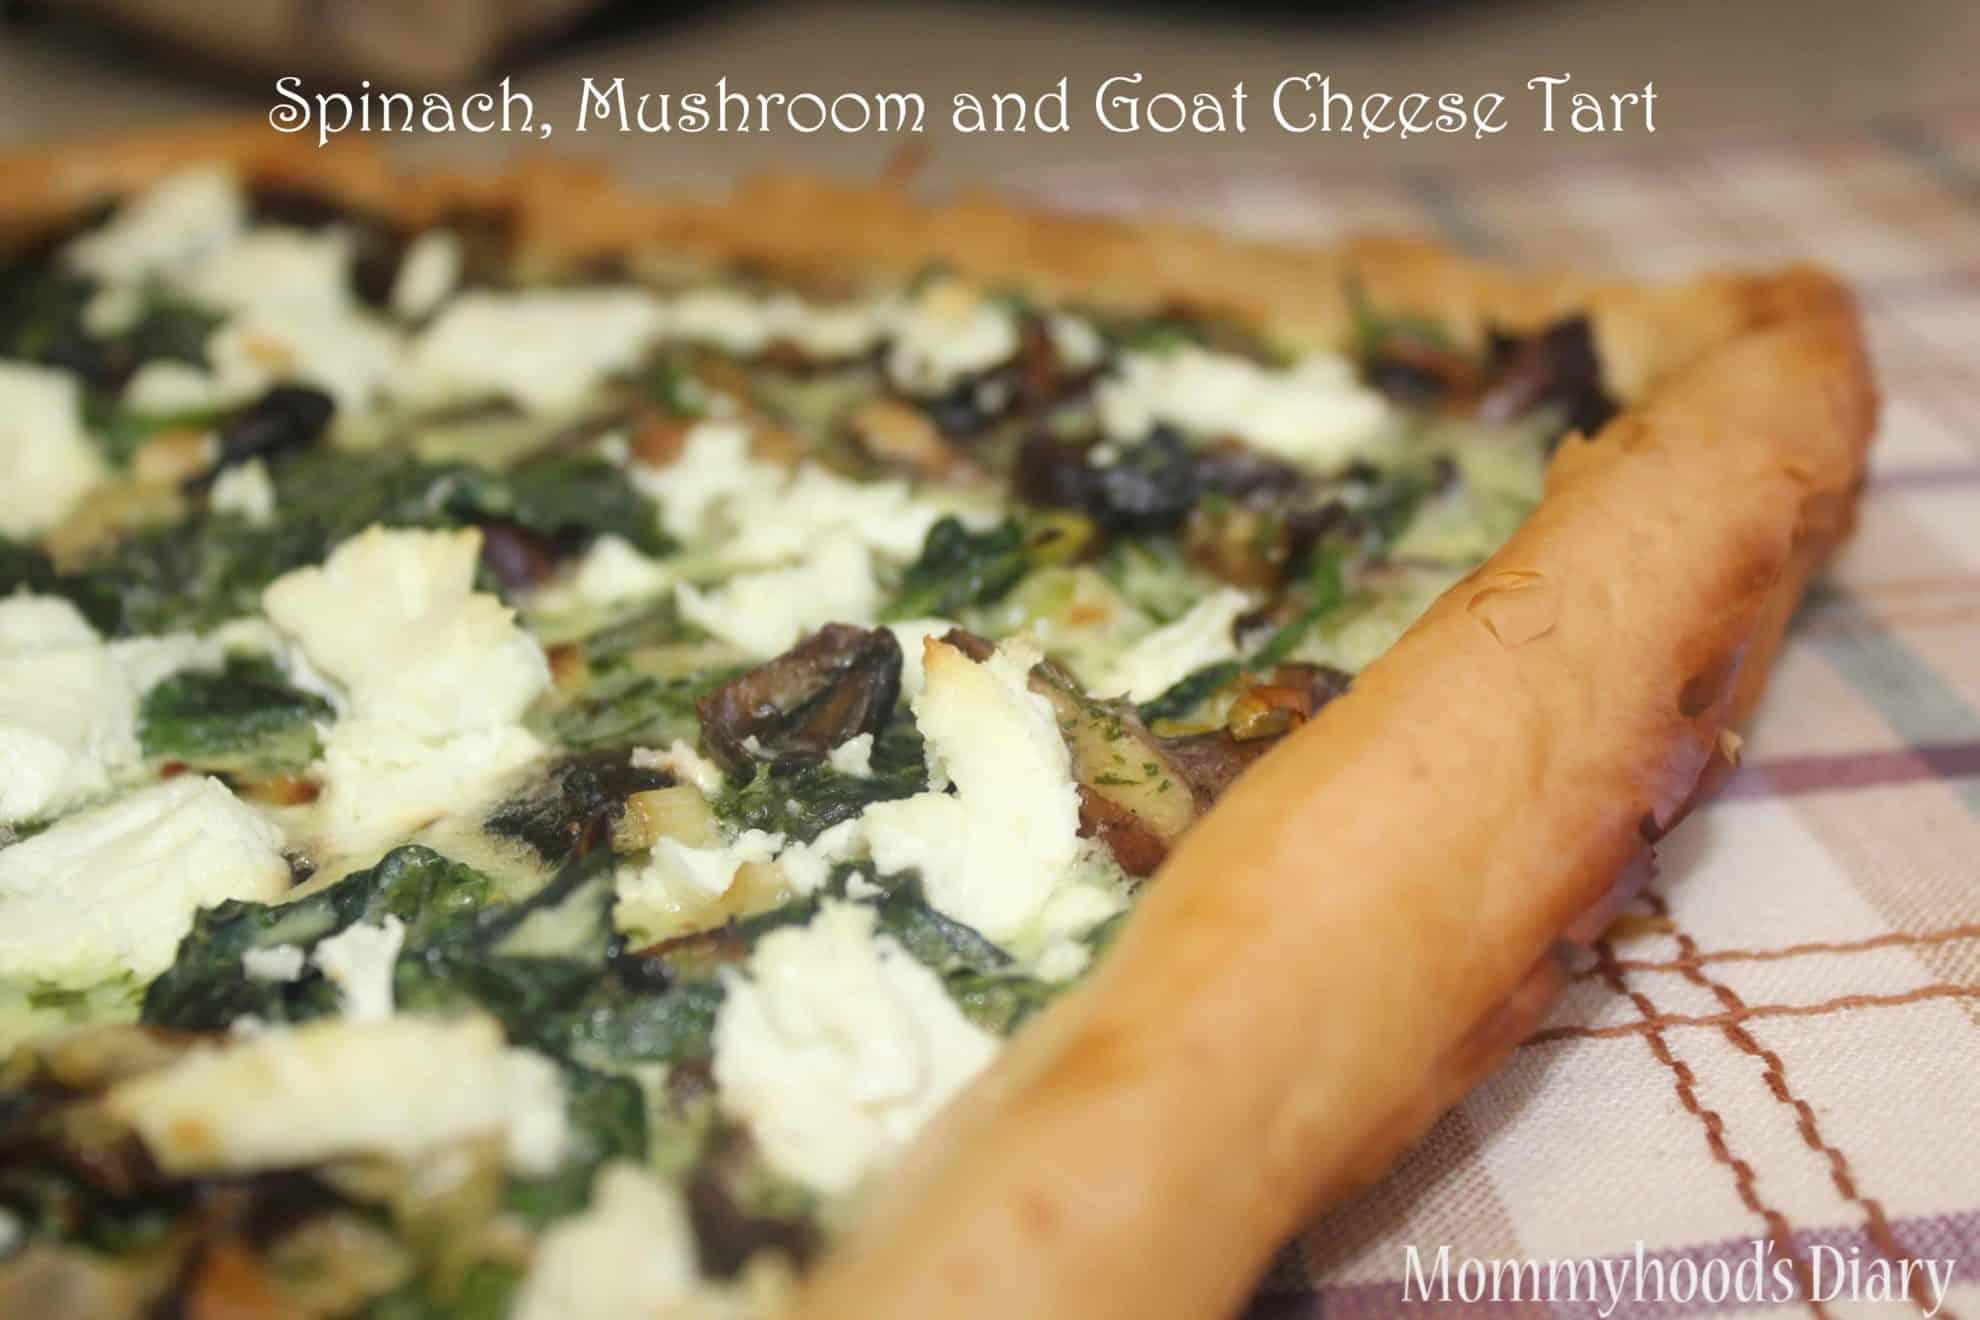 Spinach, Mushroom and Goat Cheese Tart